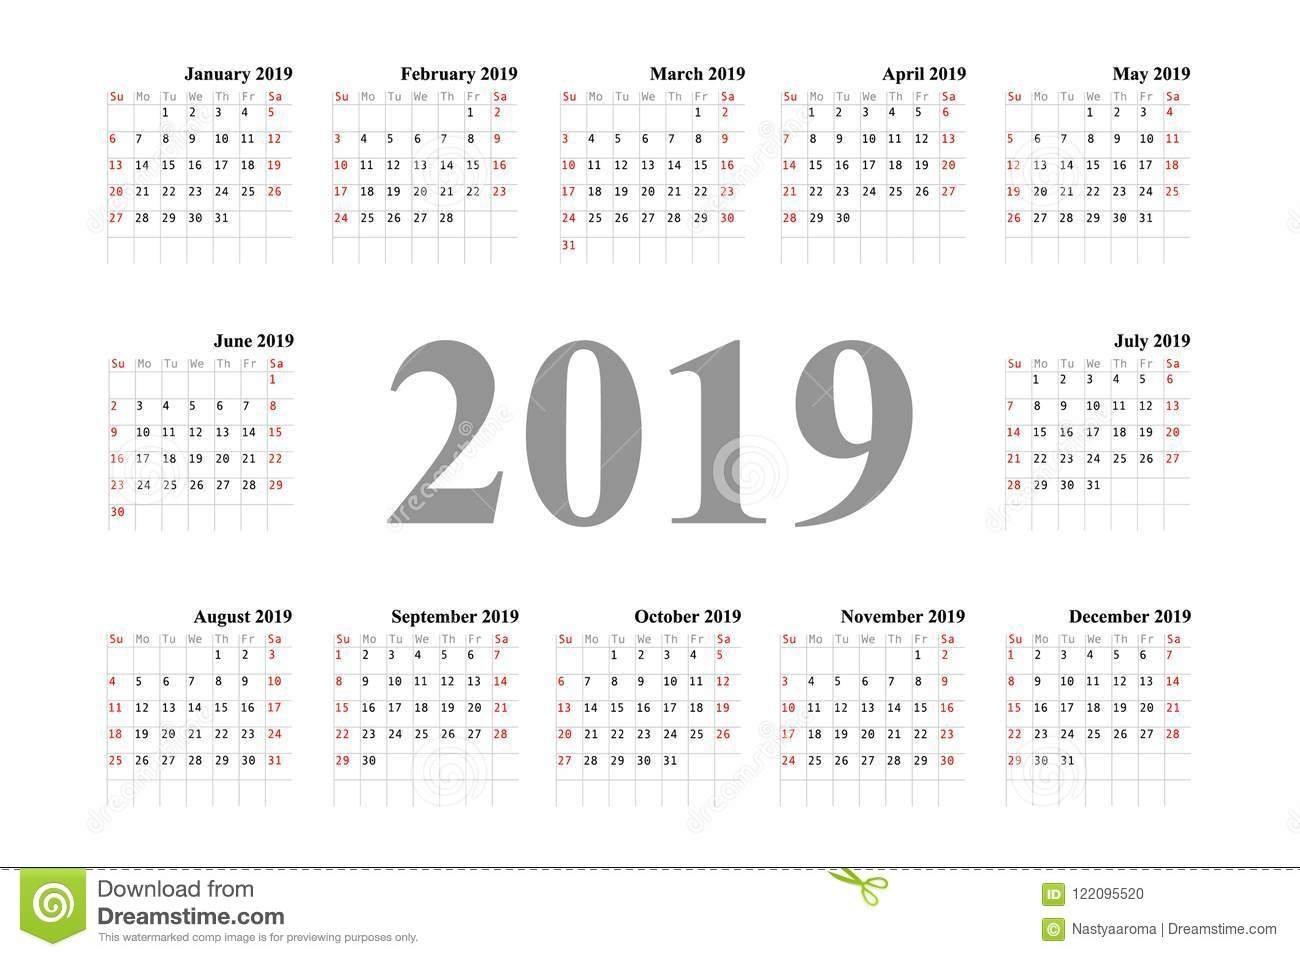 Calendar Template Design 2019 Stock Illustration – Illustration Of Calendar Week 36 2019